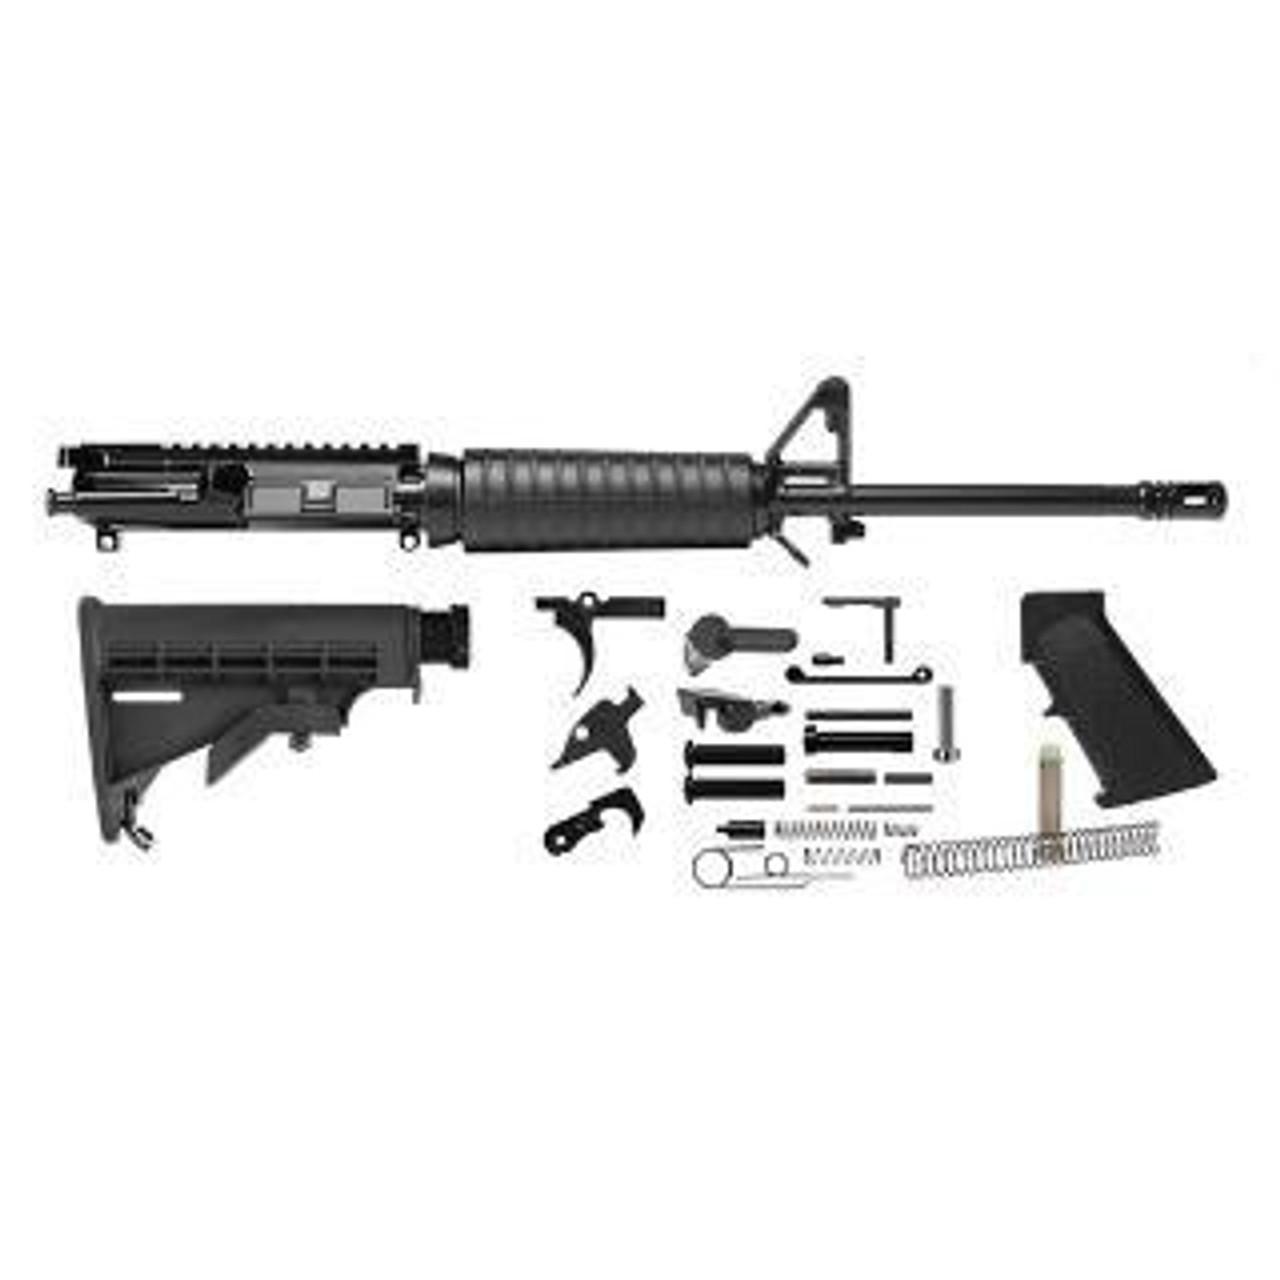 Del Ton Rifle Kit- With Heavy Barrel- CALIFORNIA LEGAL- 5.56